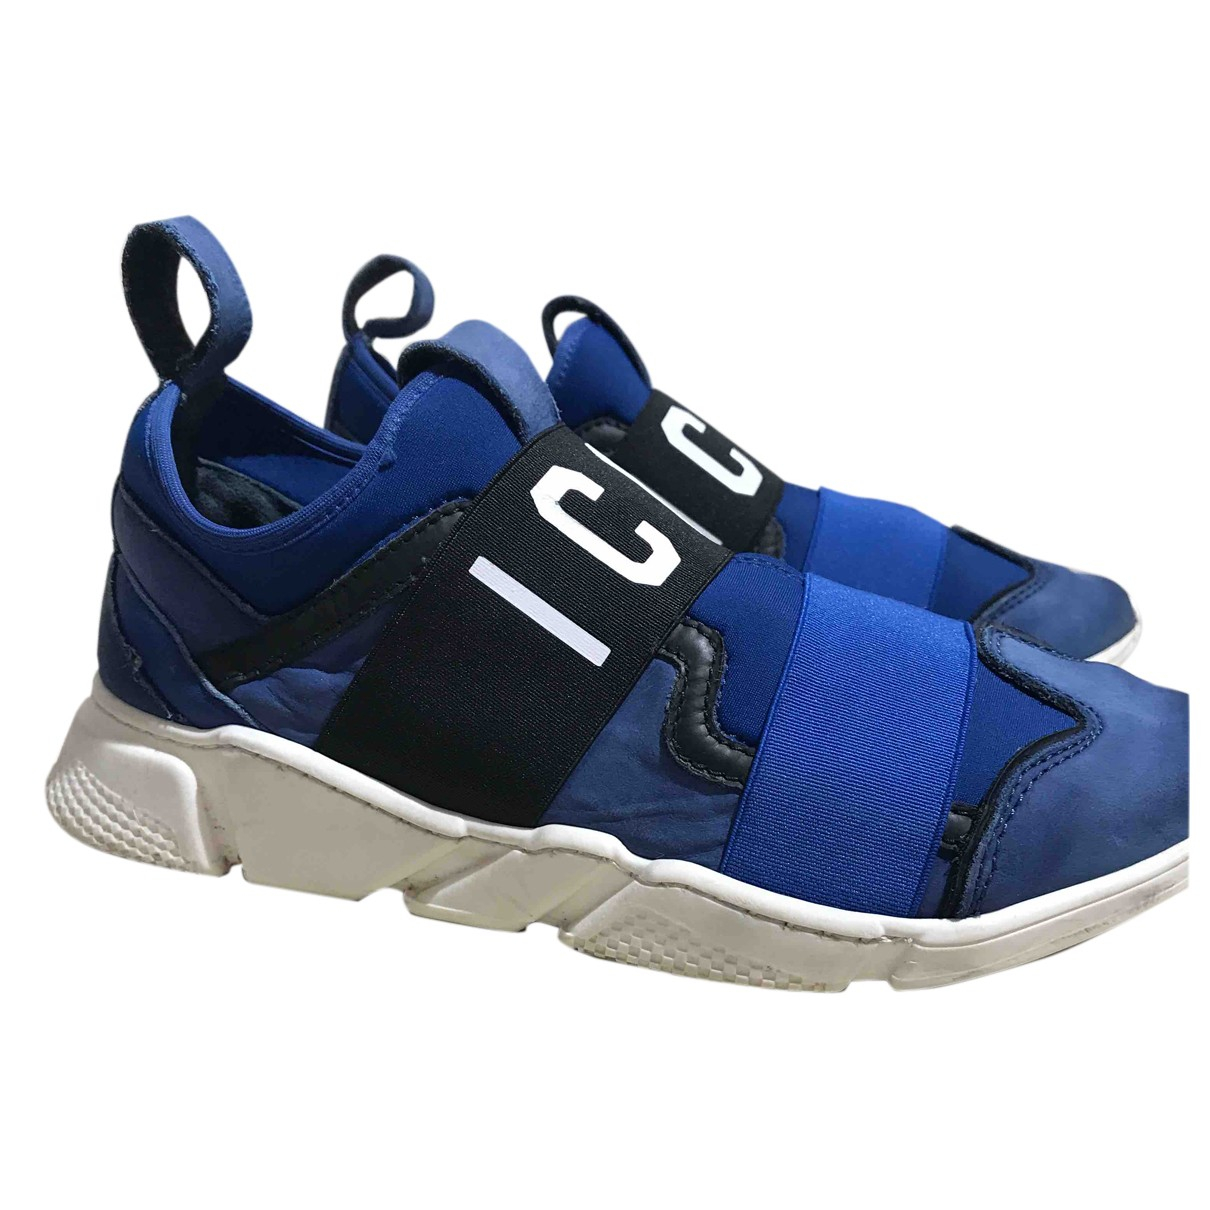 Dsquared2 \N Sneakers in  Blau Leinen